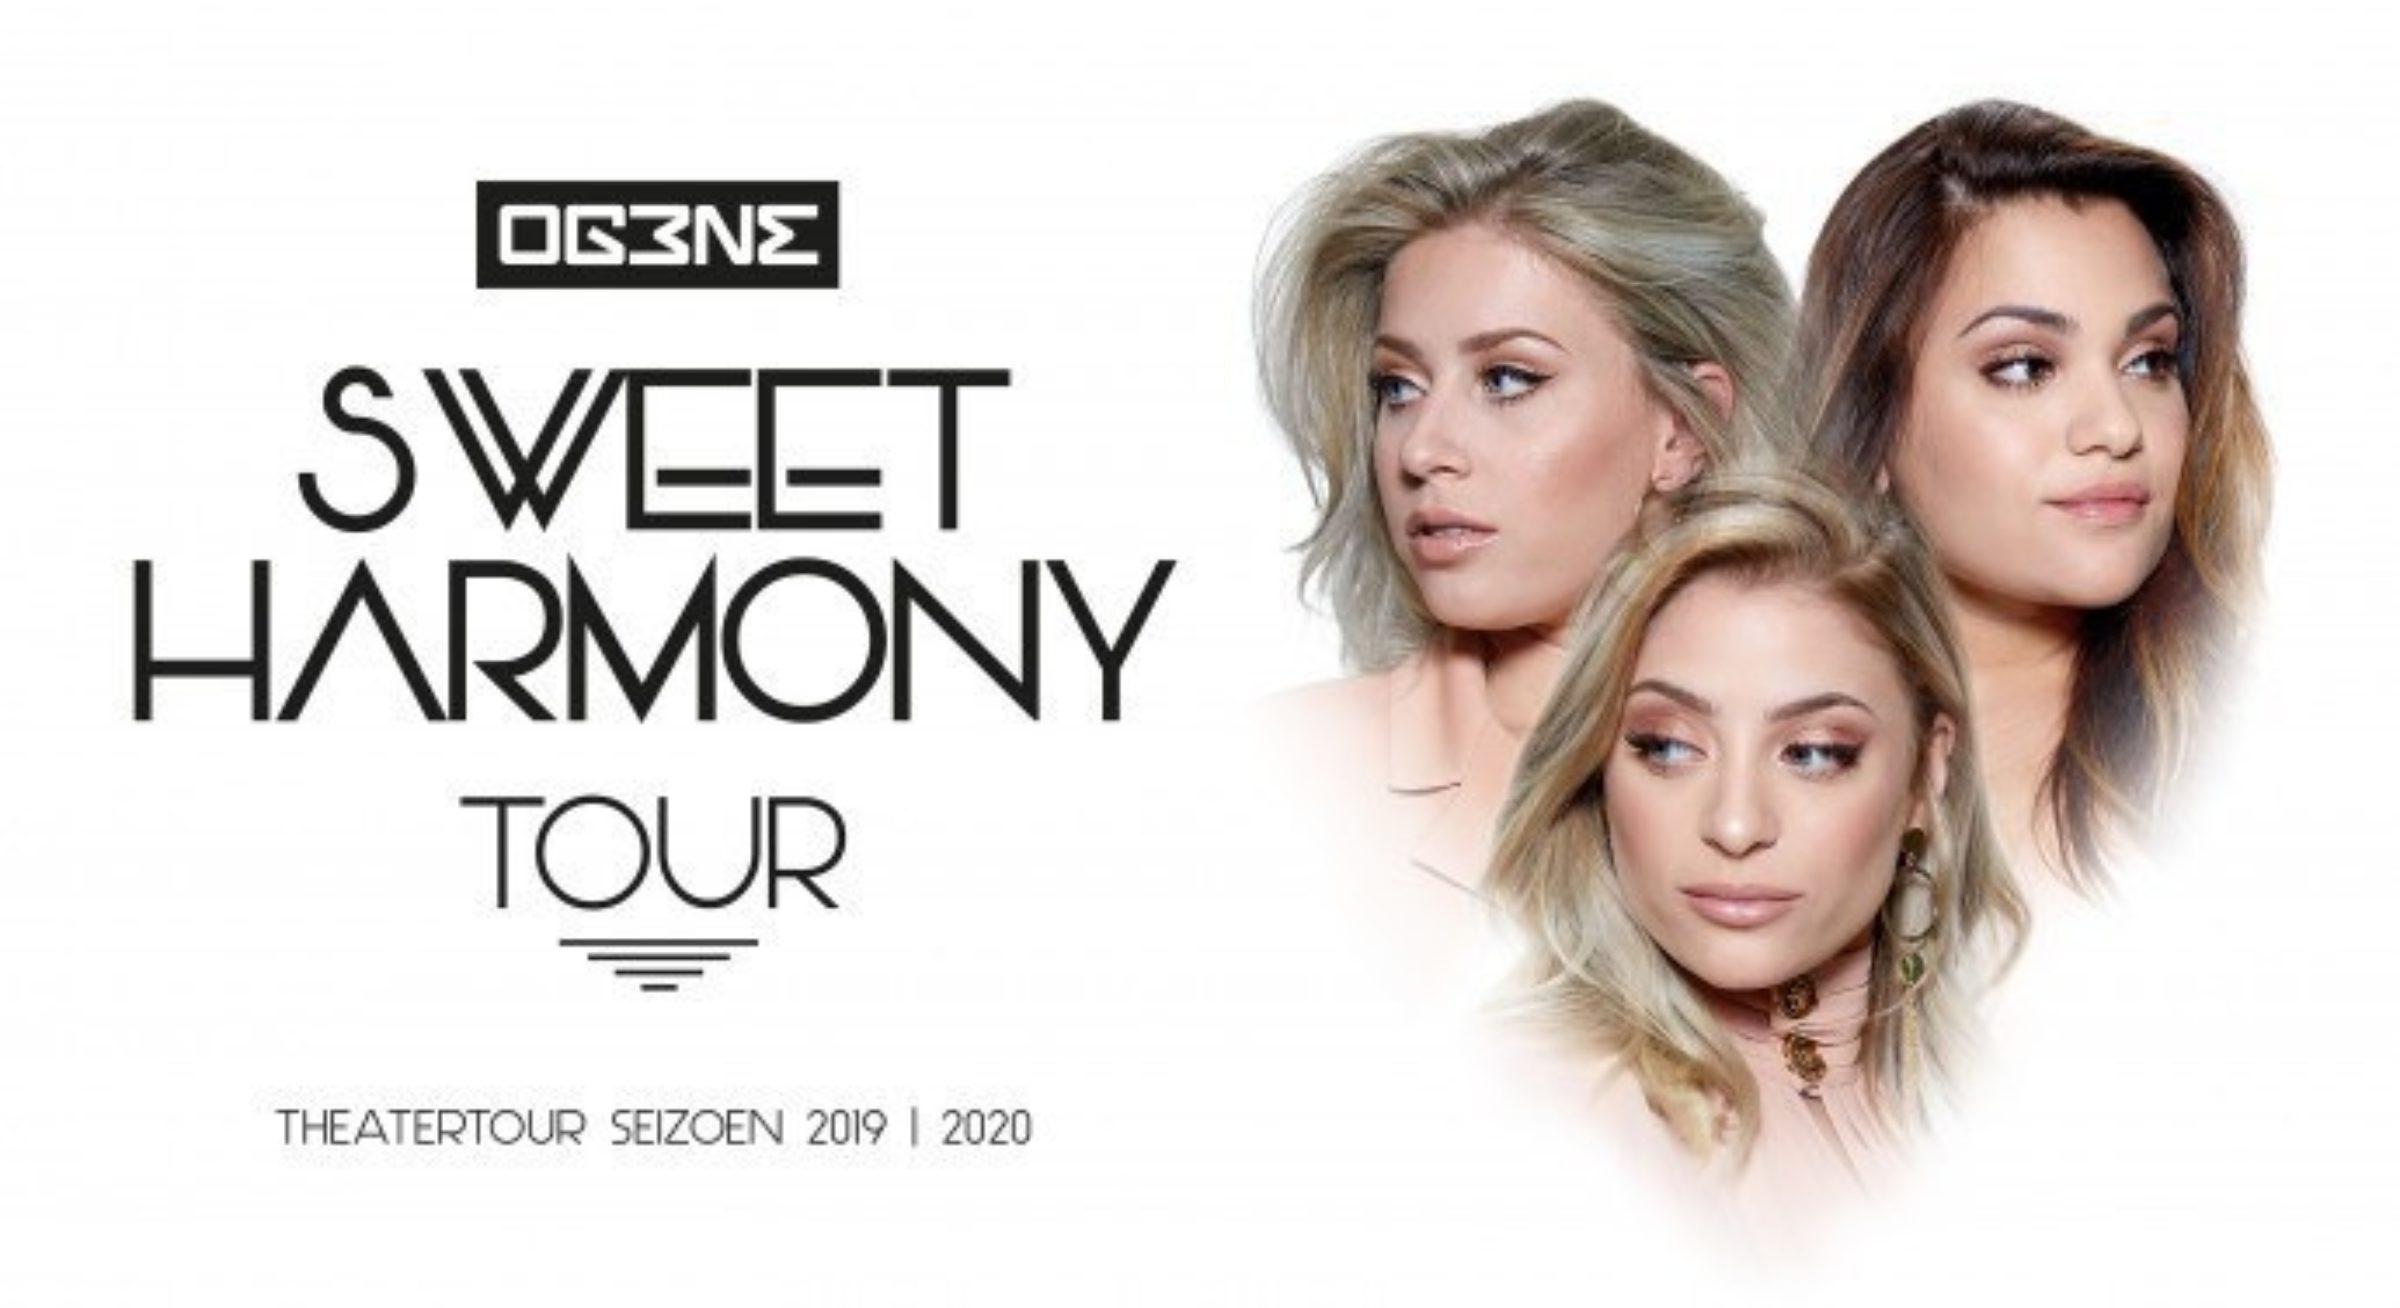 Sweet Harmony Tour 2296 1551264244 35hxcy5ns5